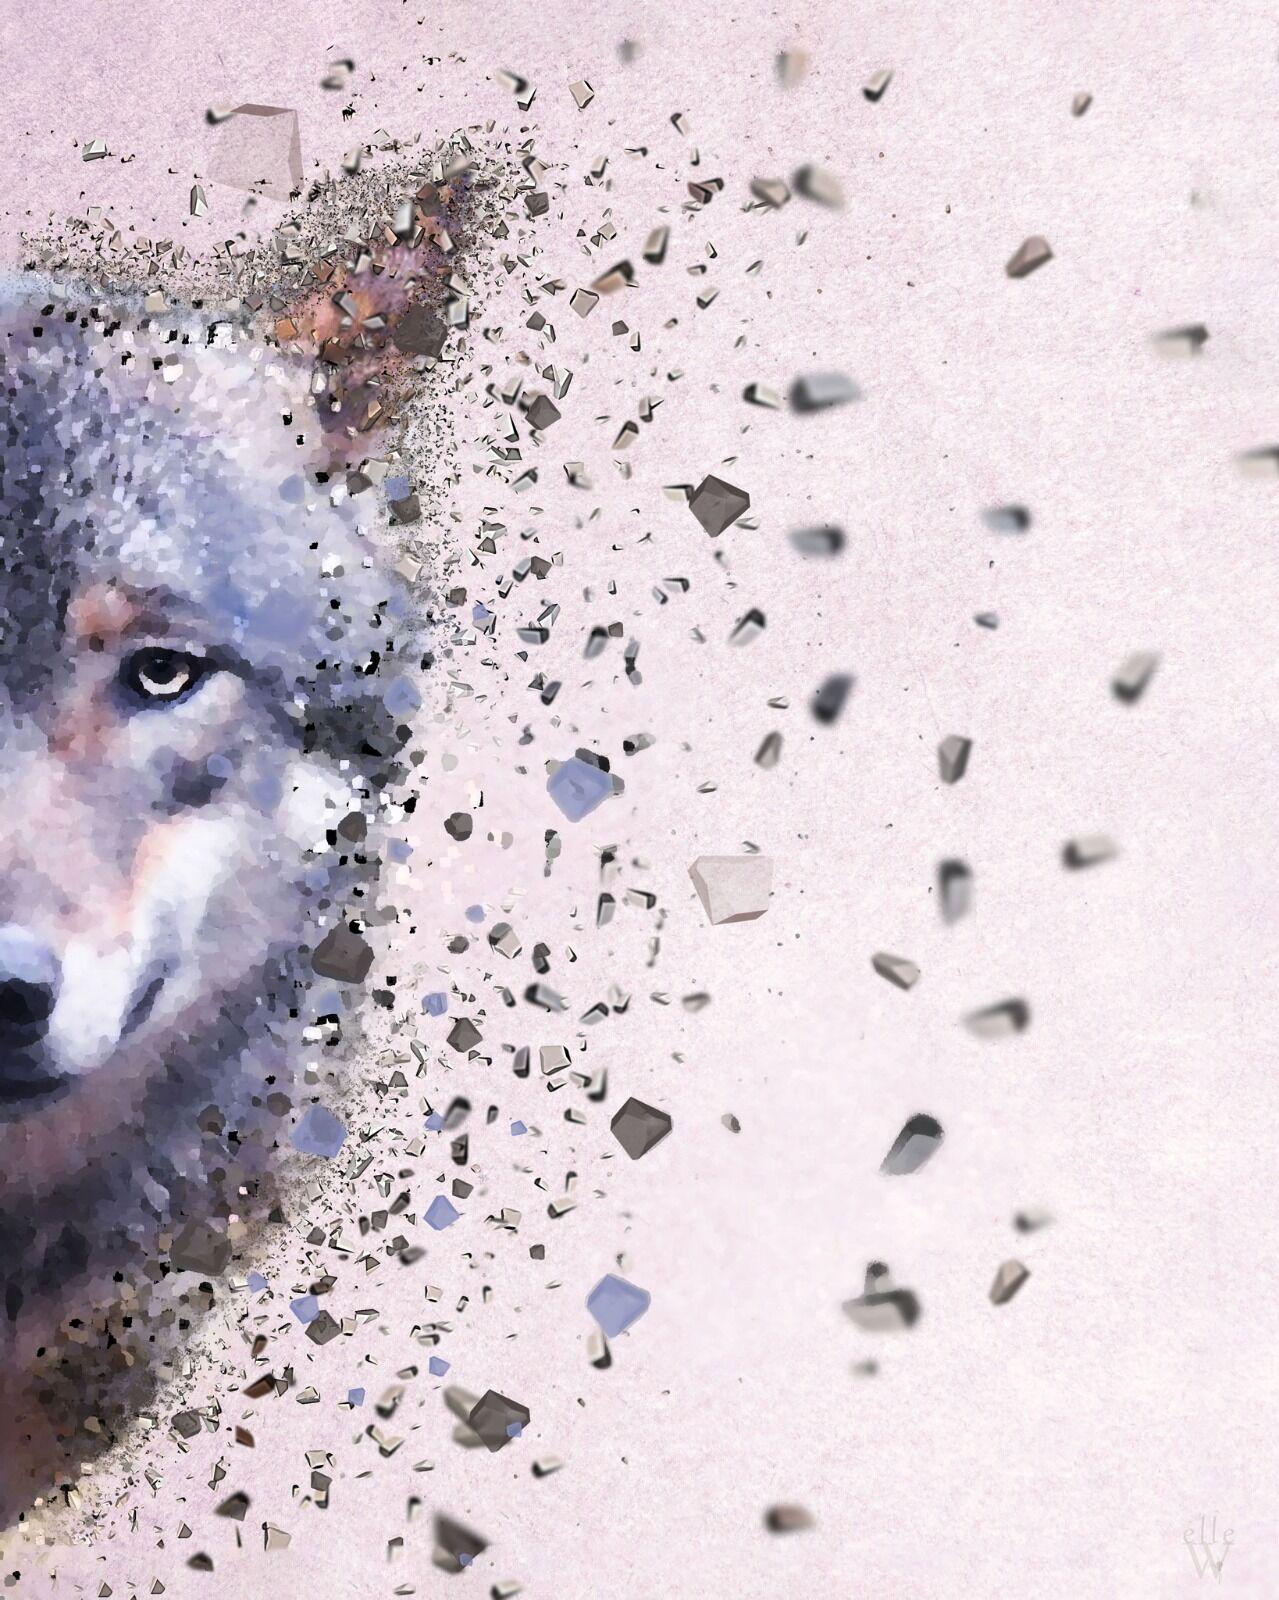 Wolf - Dispersion Effect